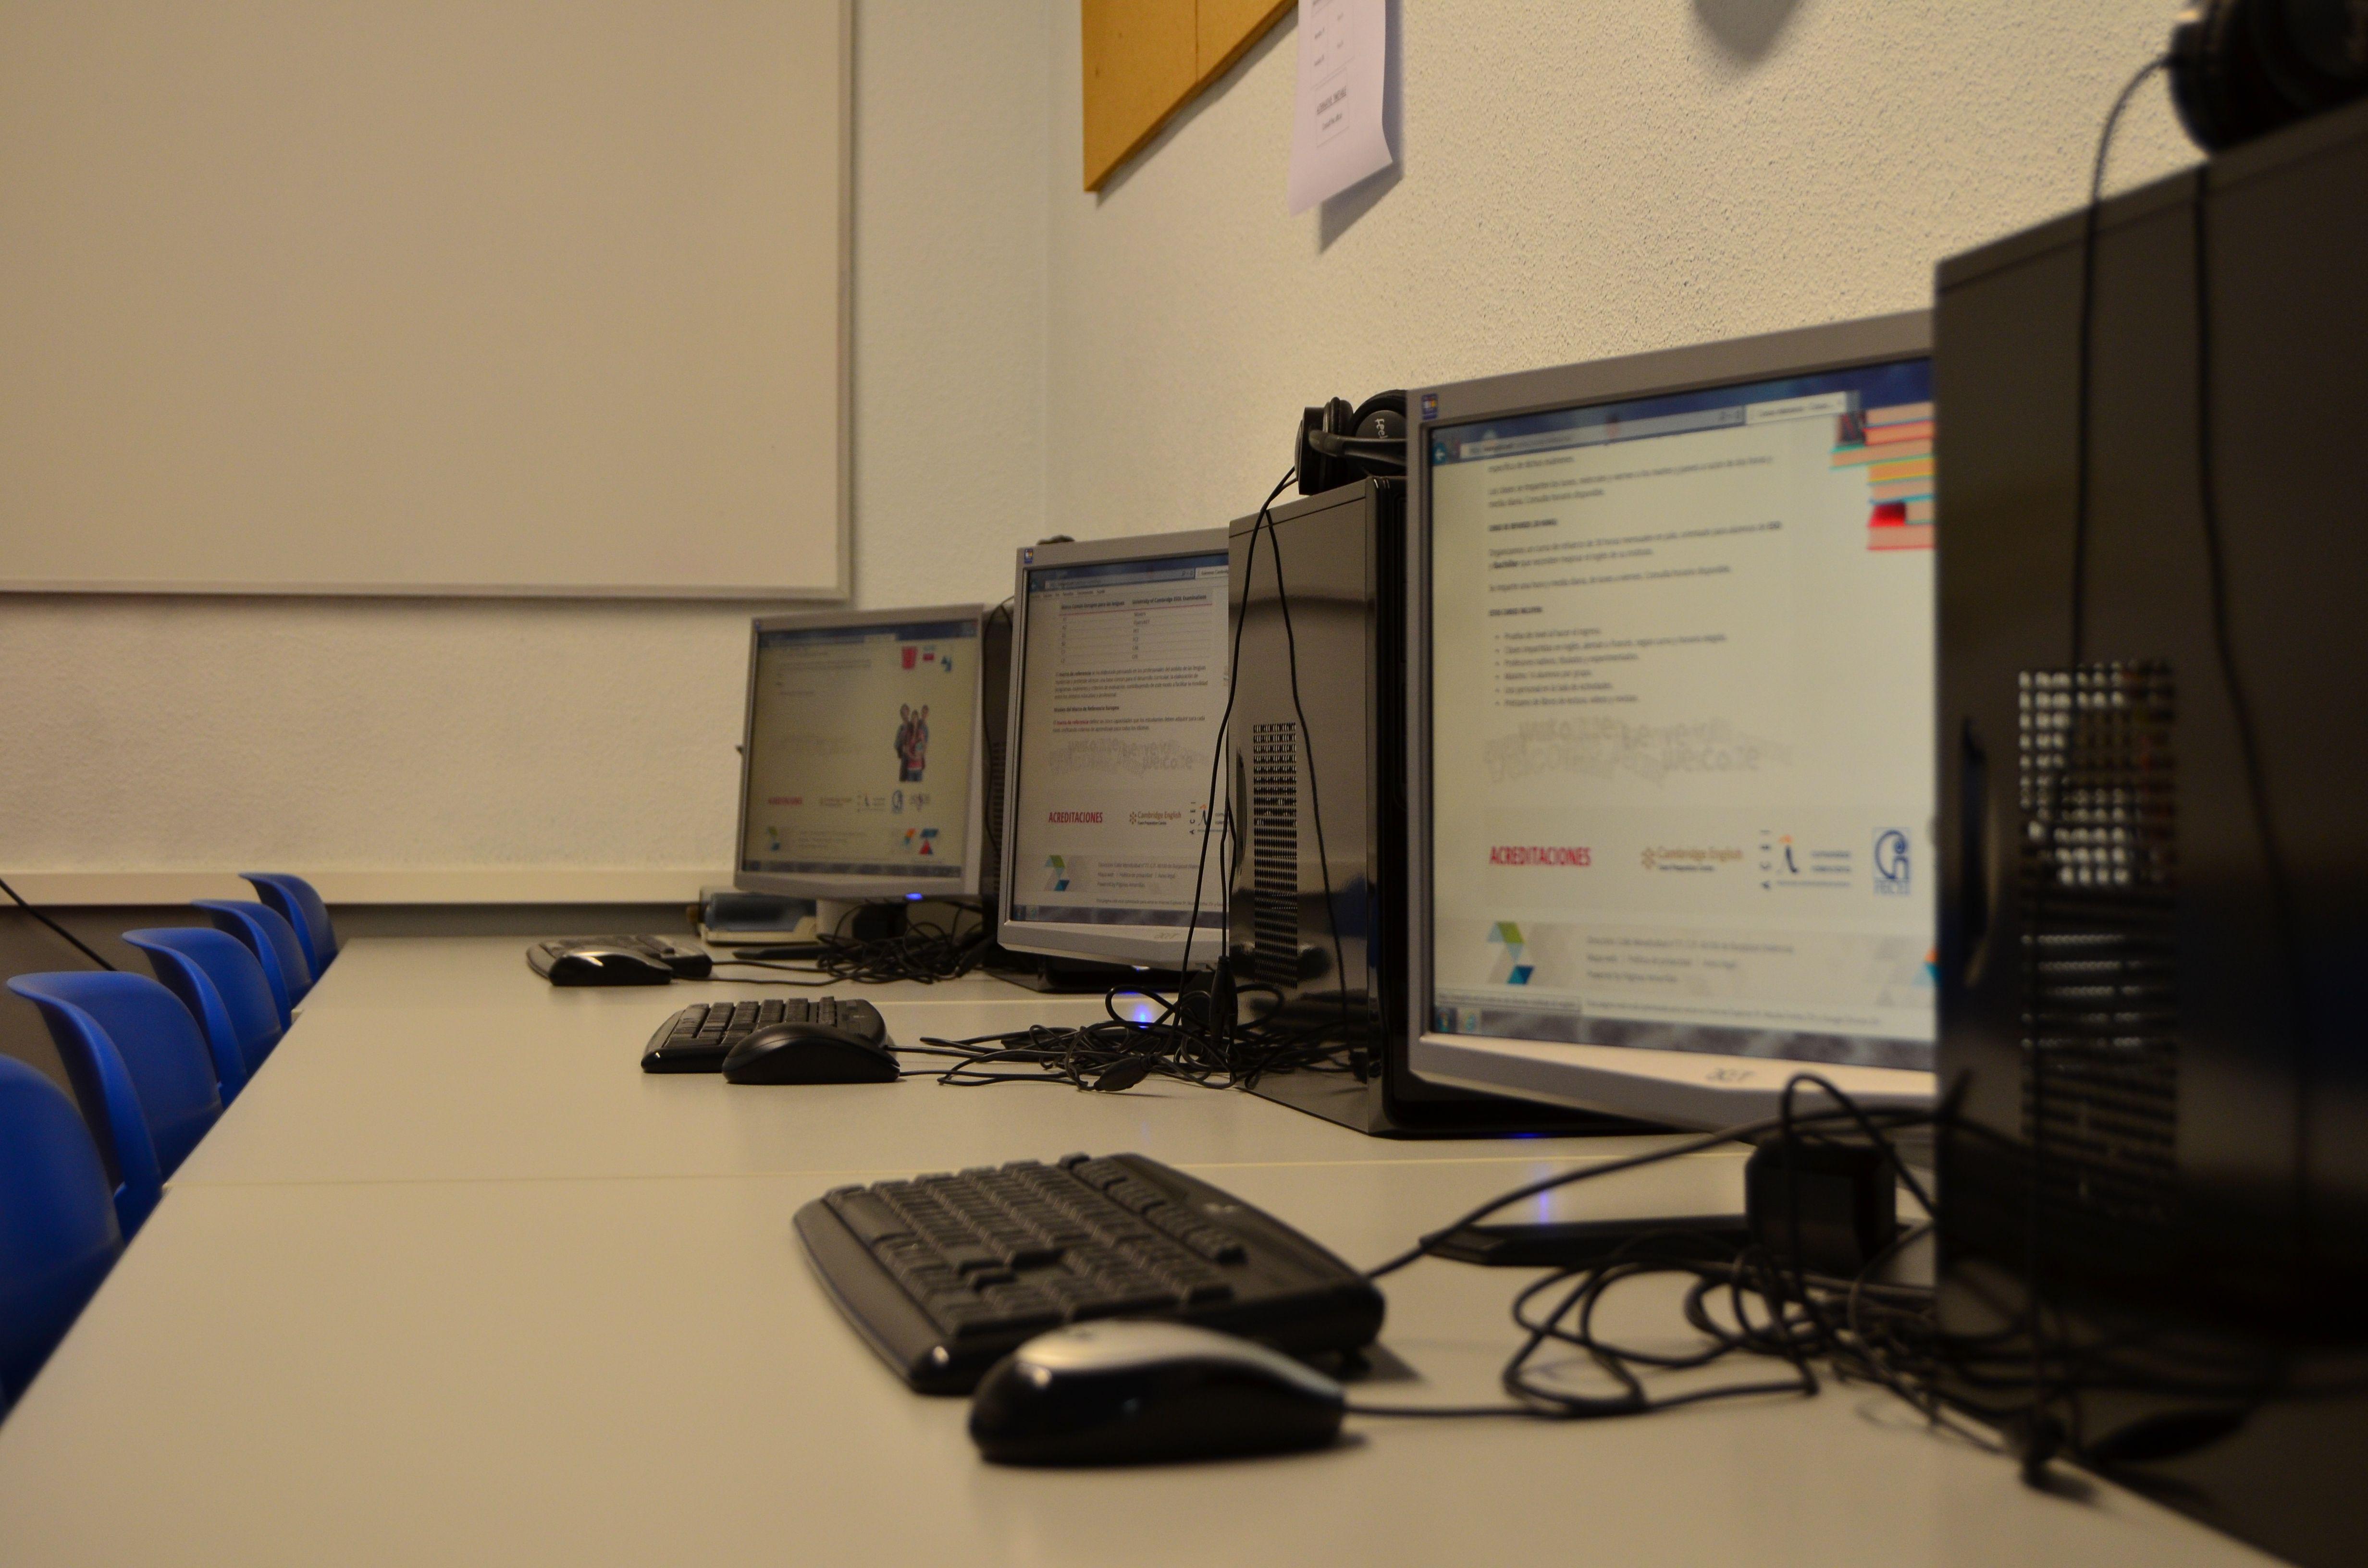 Foto 10 de Academias de idiomas en Burjassot | Institute of English